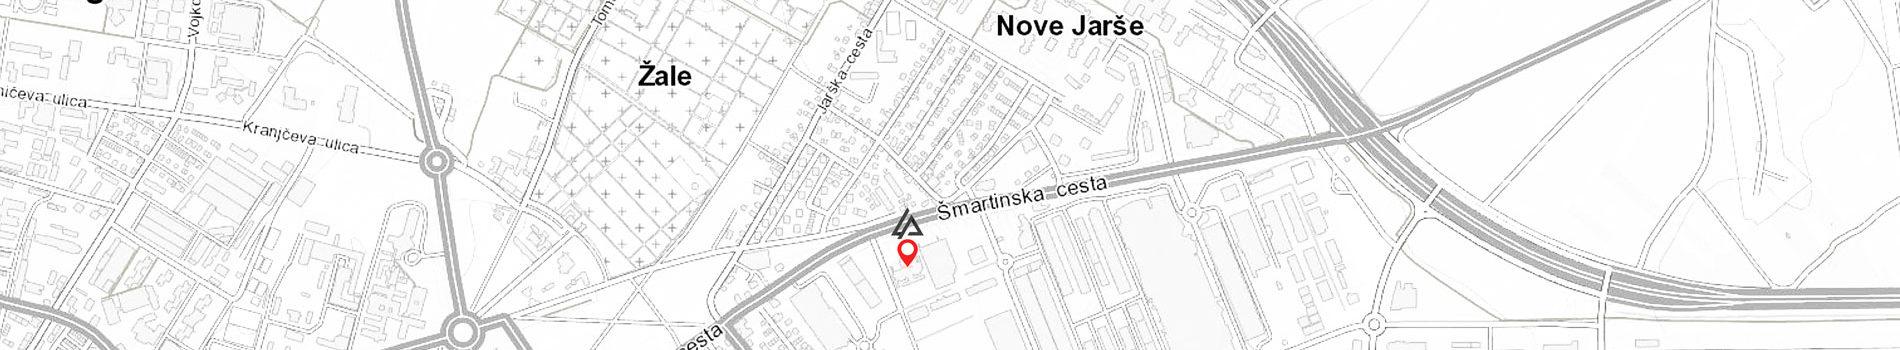 zemljevid_AAB